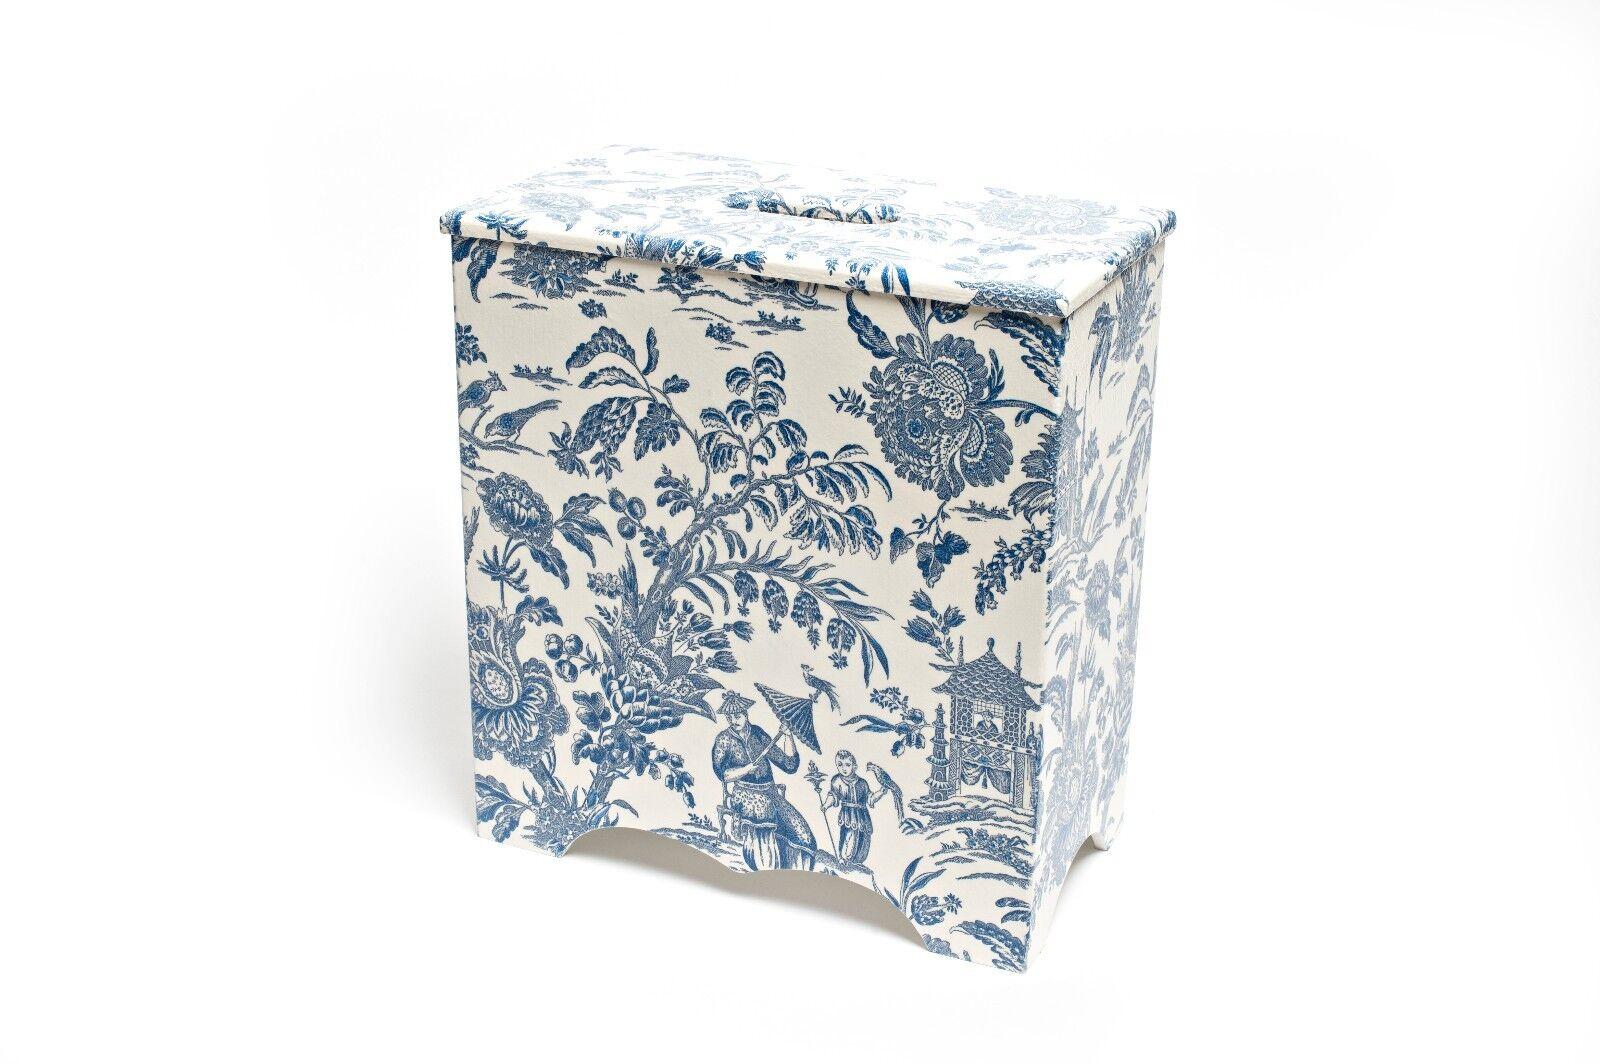 Toilet roll holder Blau Oriental Wooden handmade ideal for bathrooms handmade